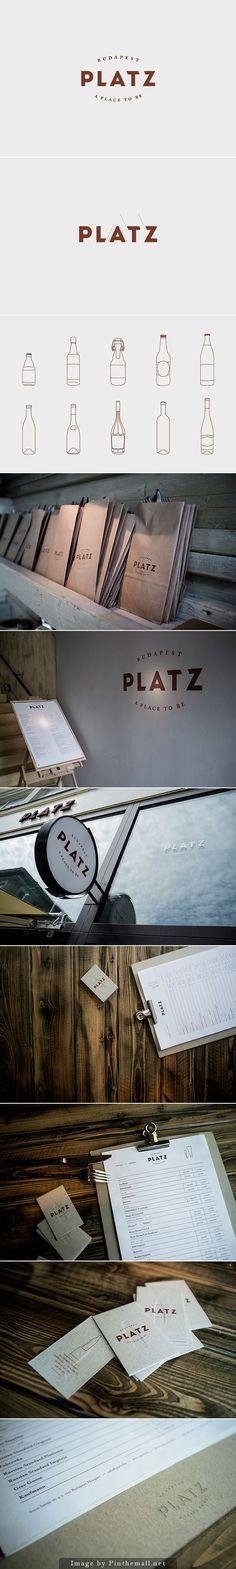 PLATZ - redesign of a restaurant & beerbar - Eszter Laki #branding #identity